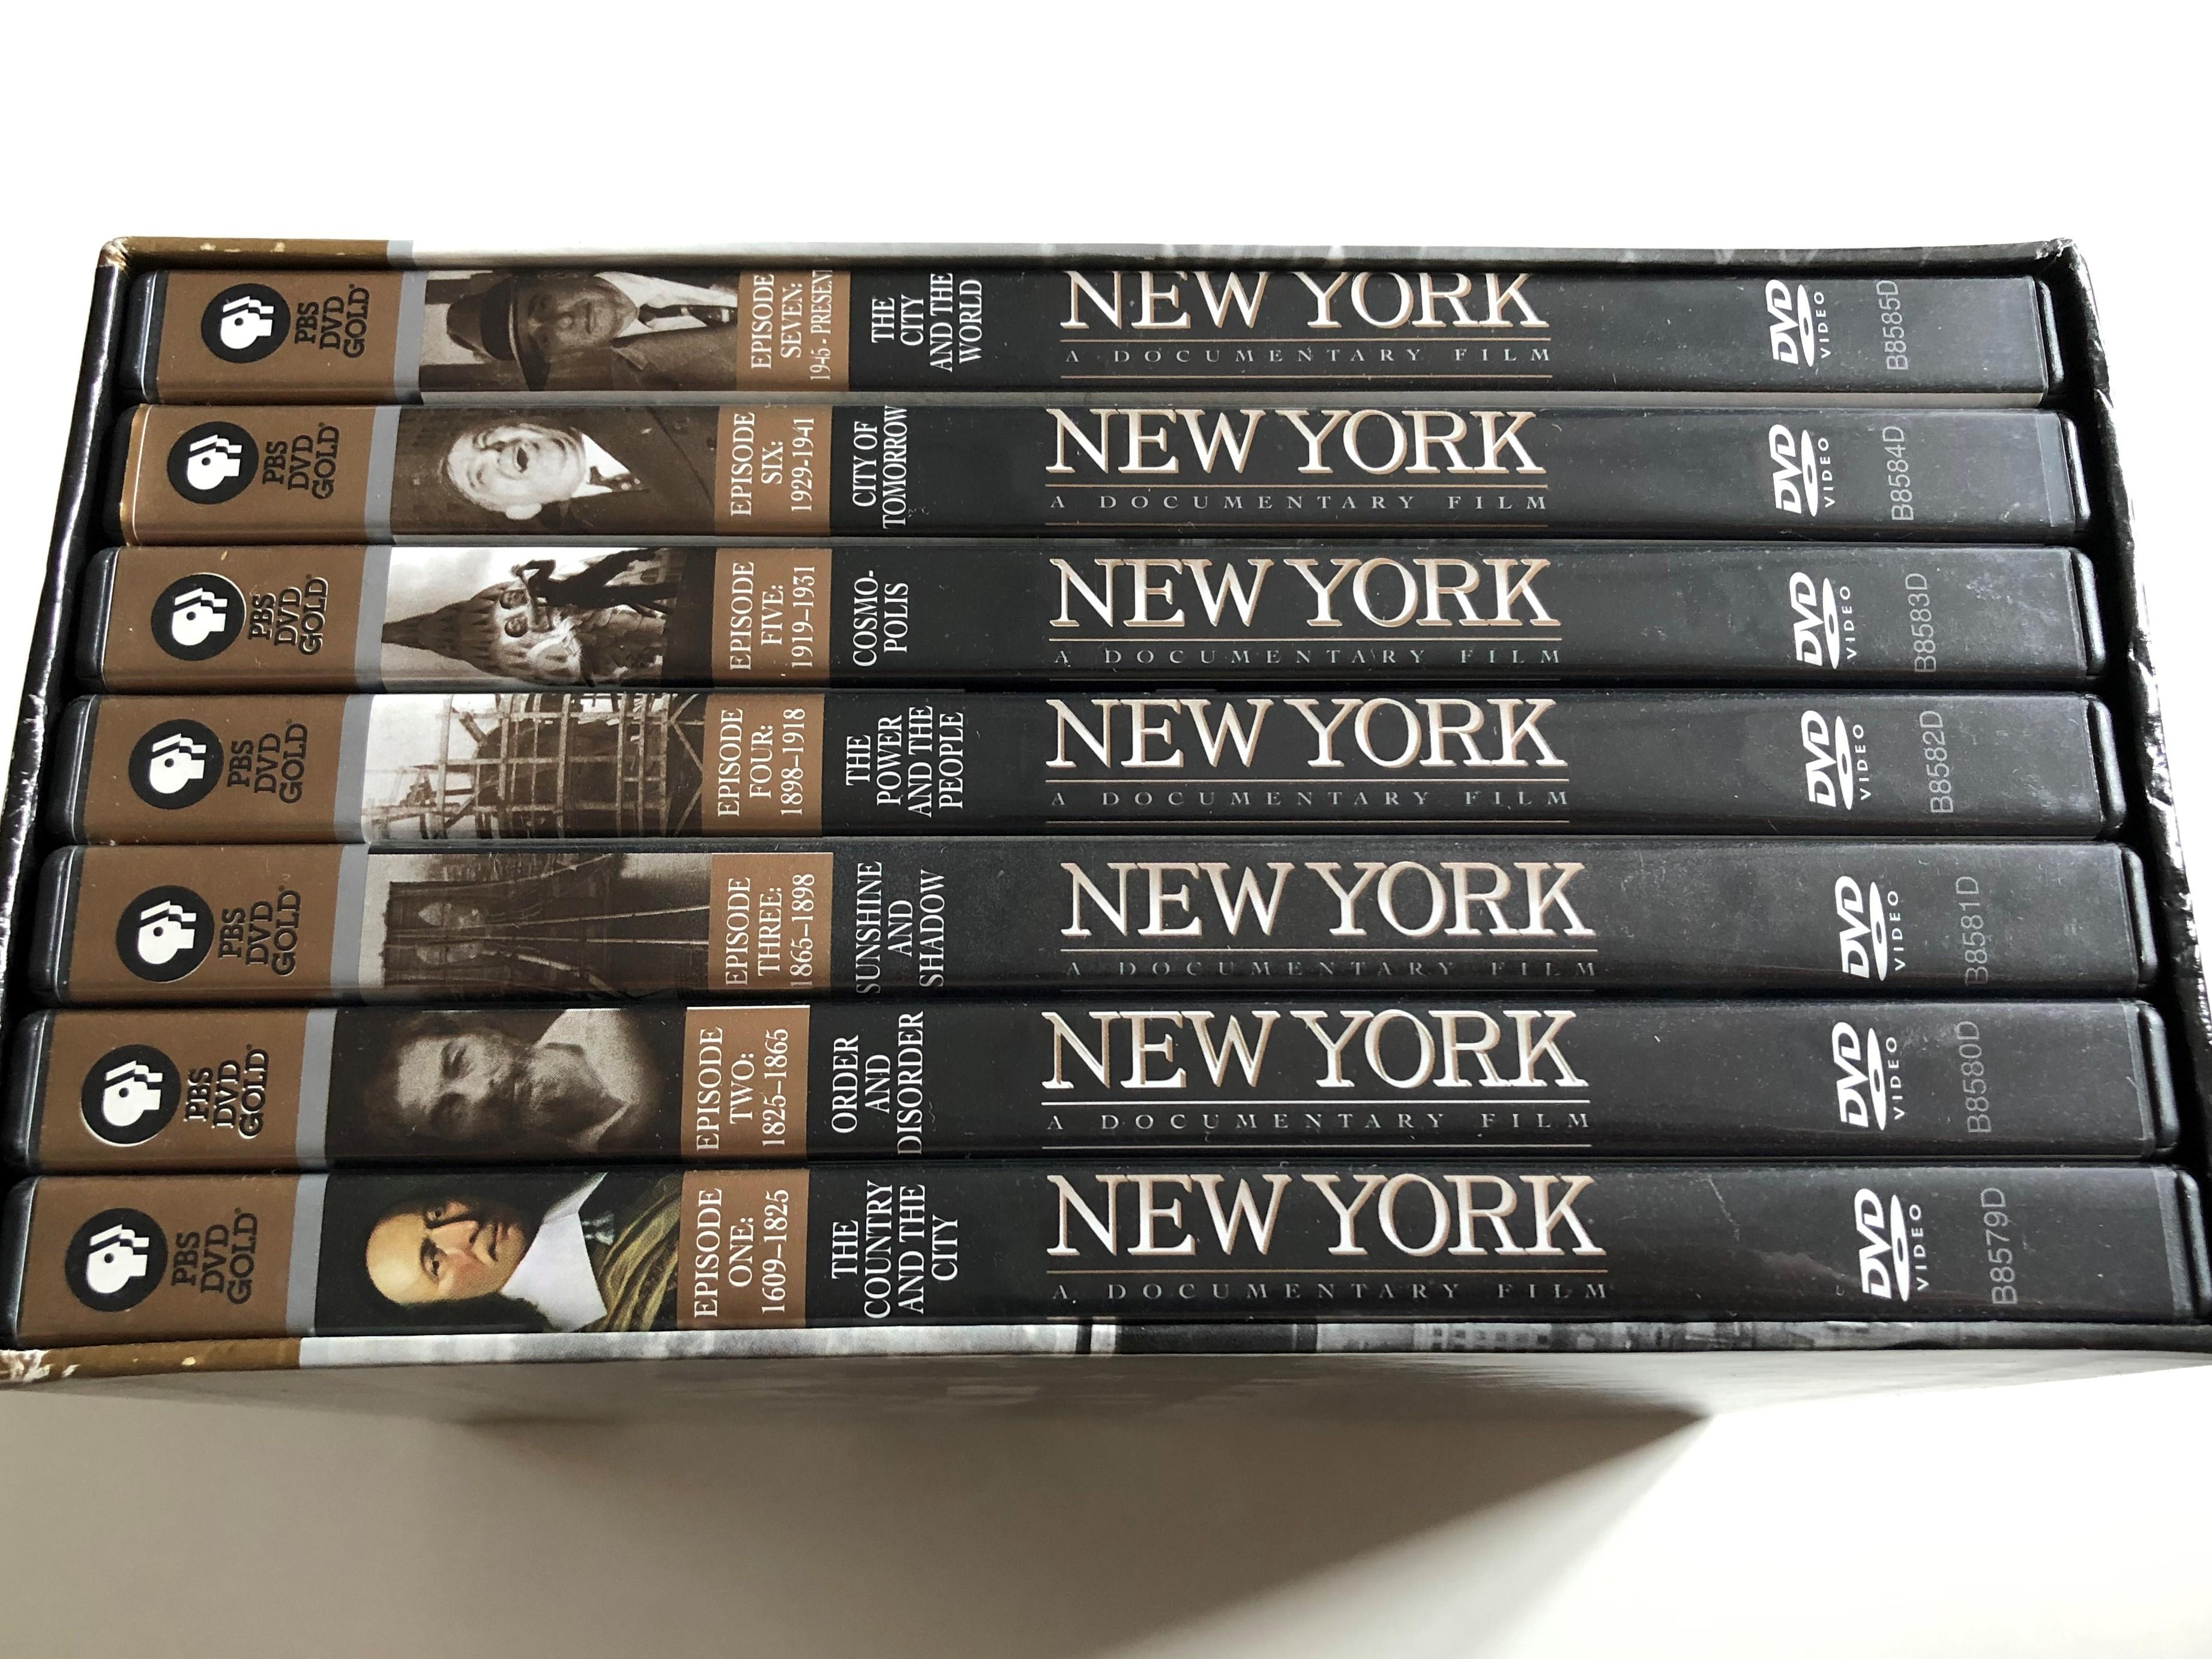 new-york-documentary-dvd-box-1999-directed-by-ric-burns-3.jpg